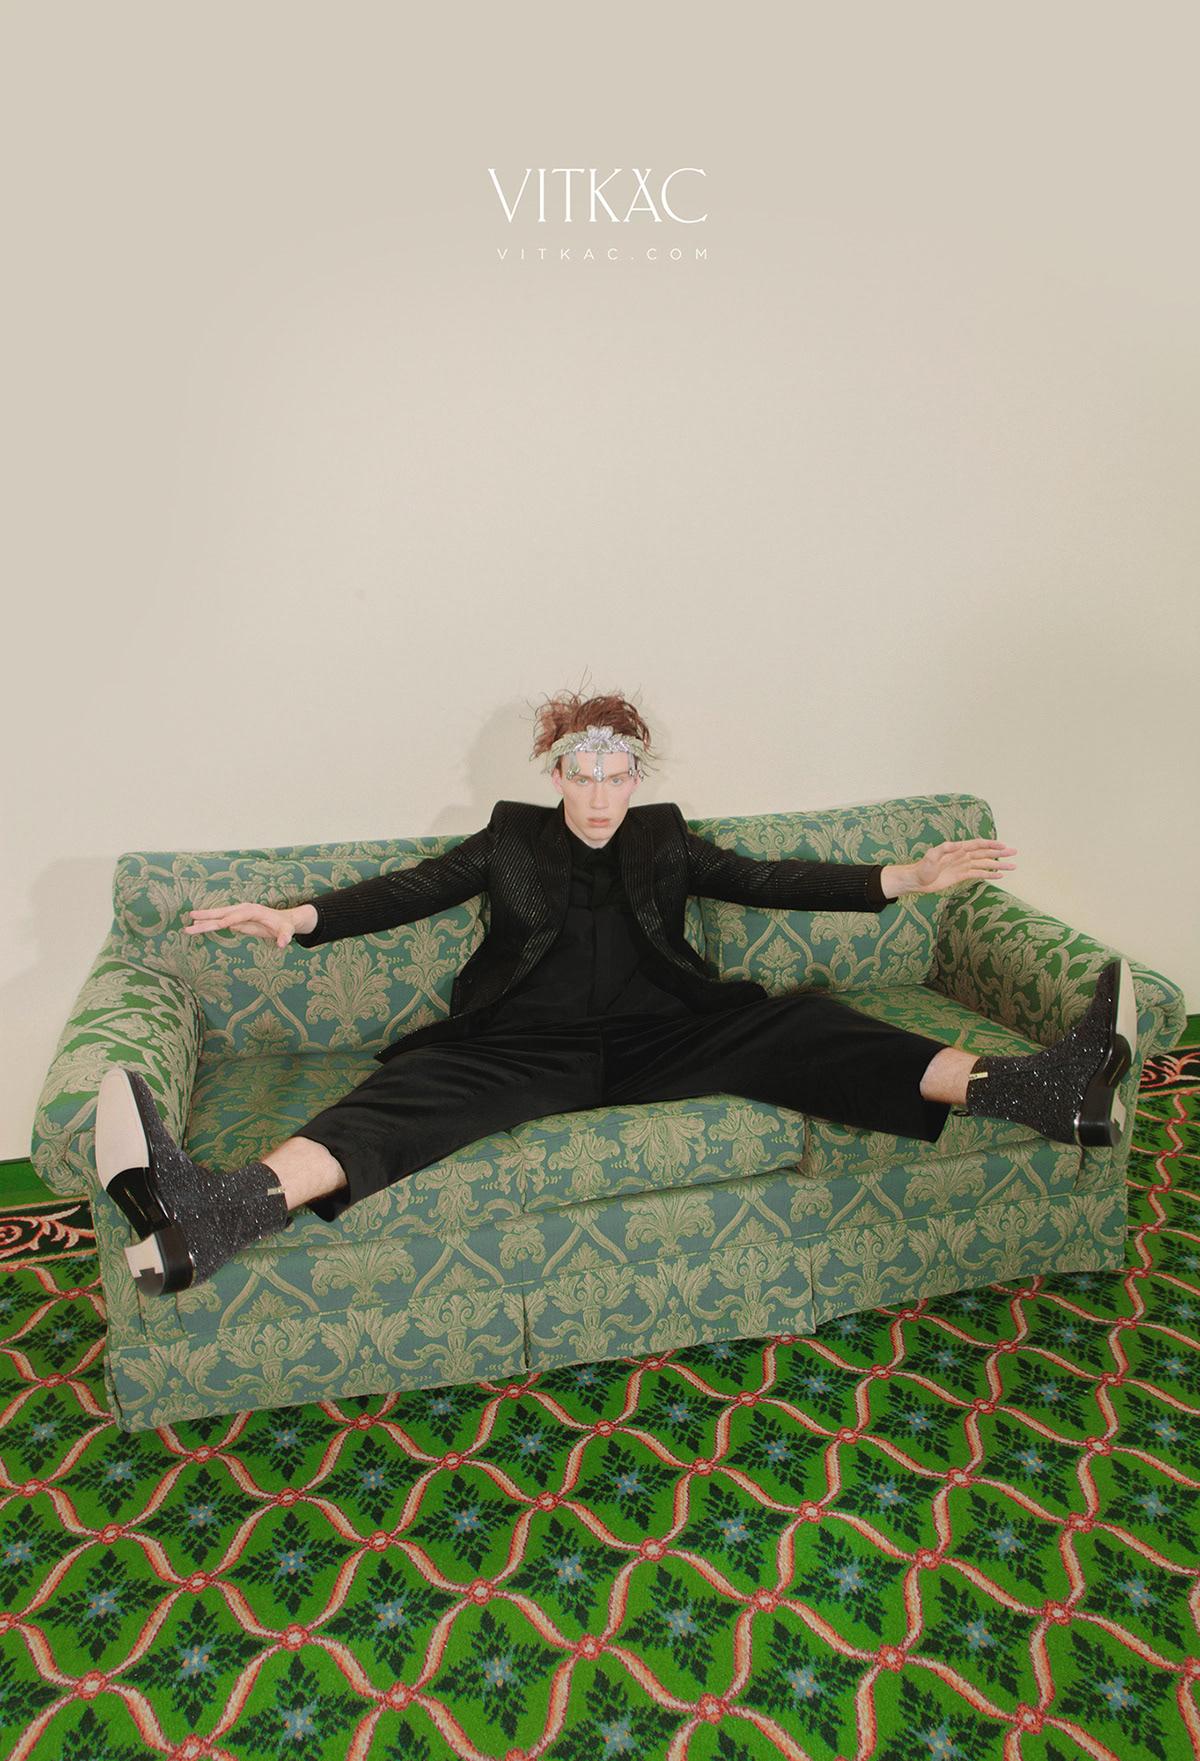 Image may contain: green, wall and clothing